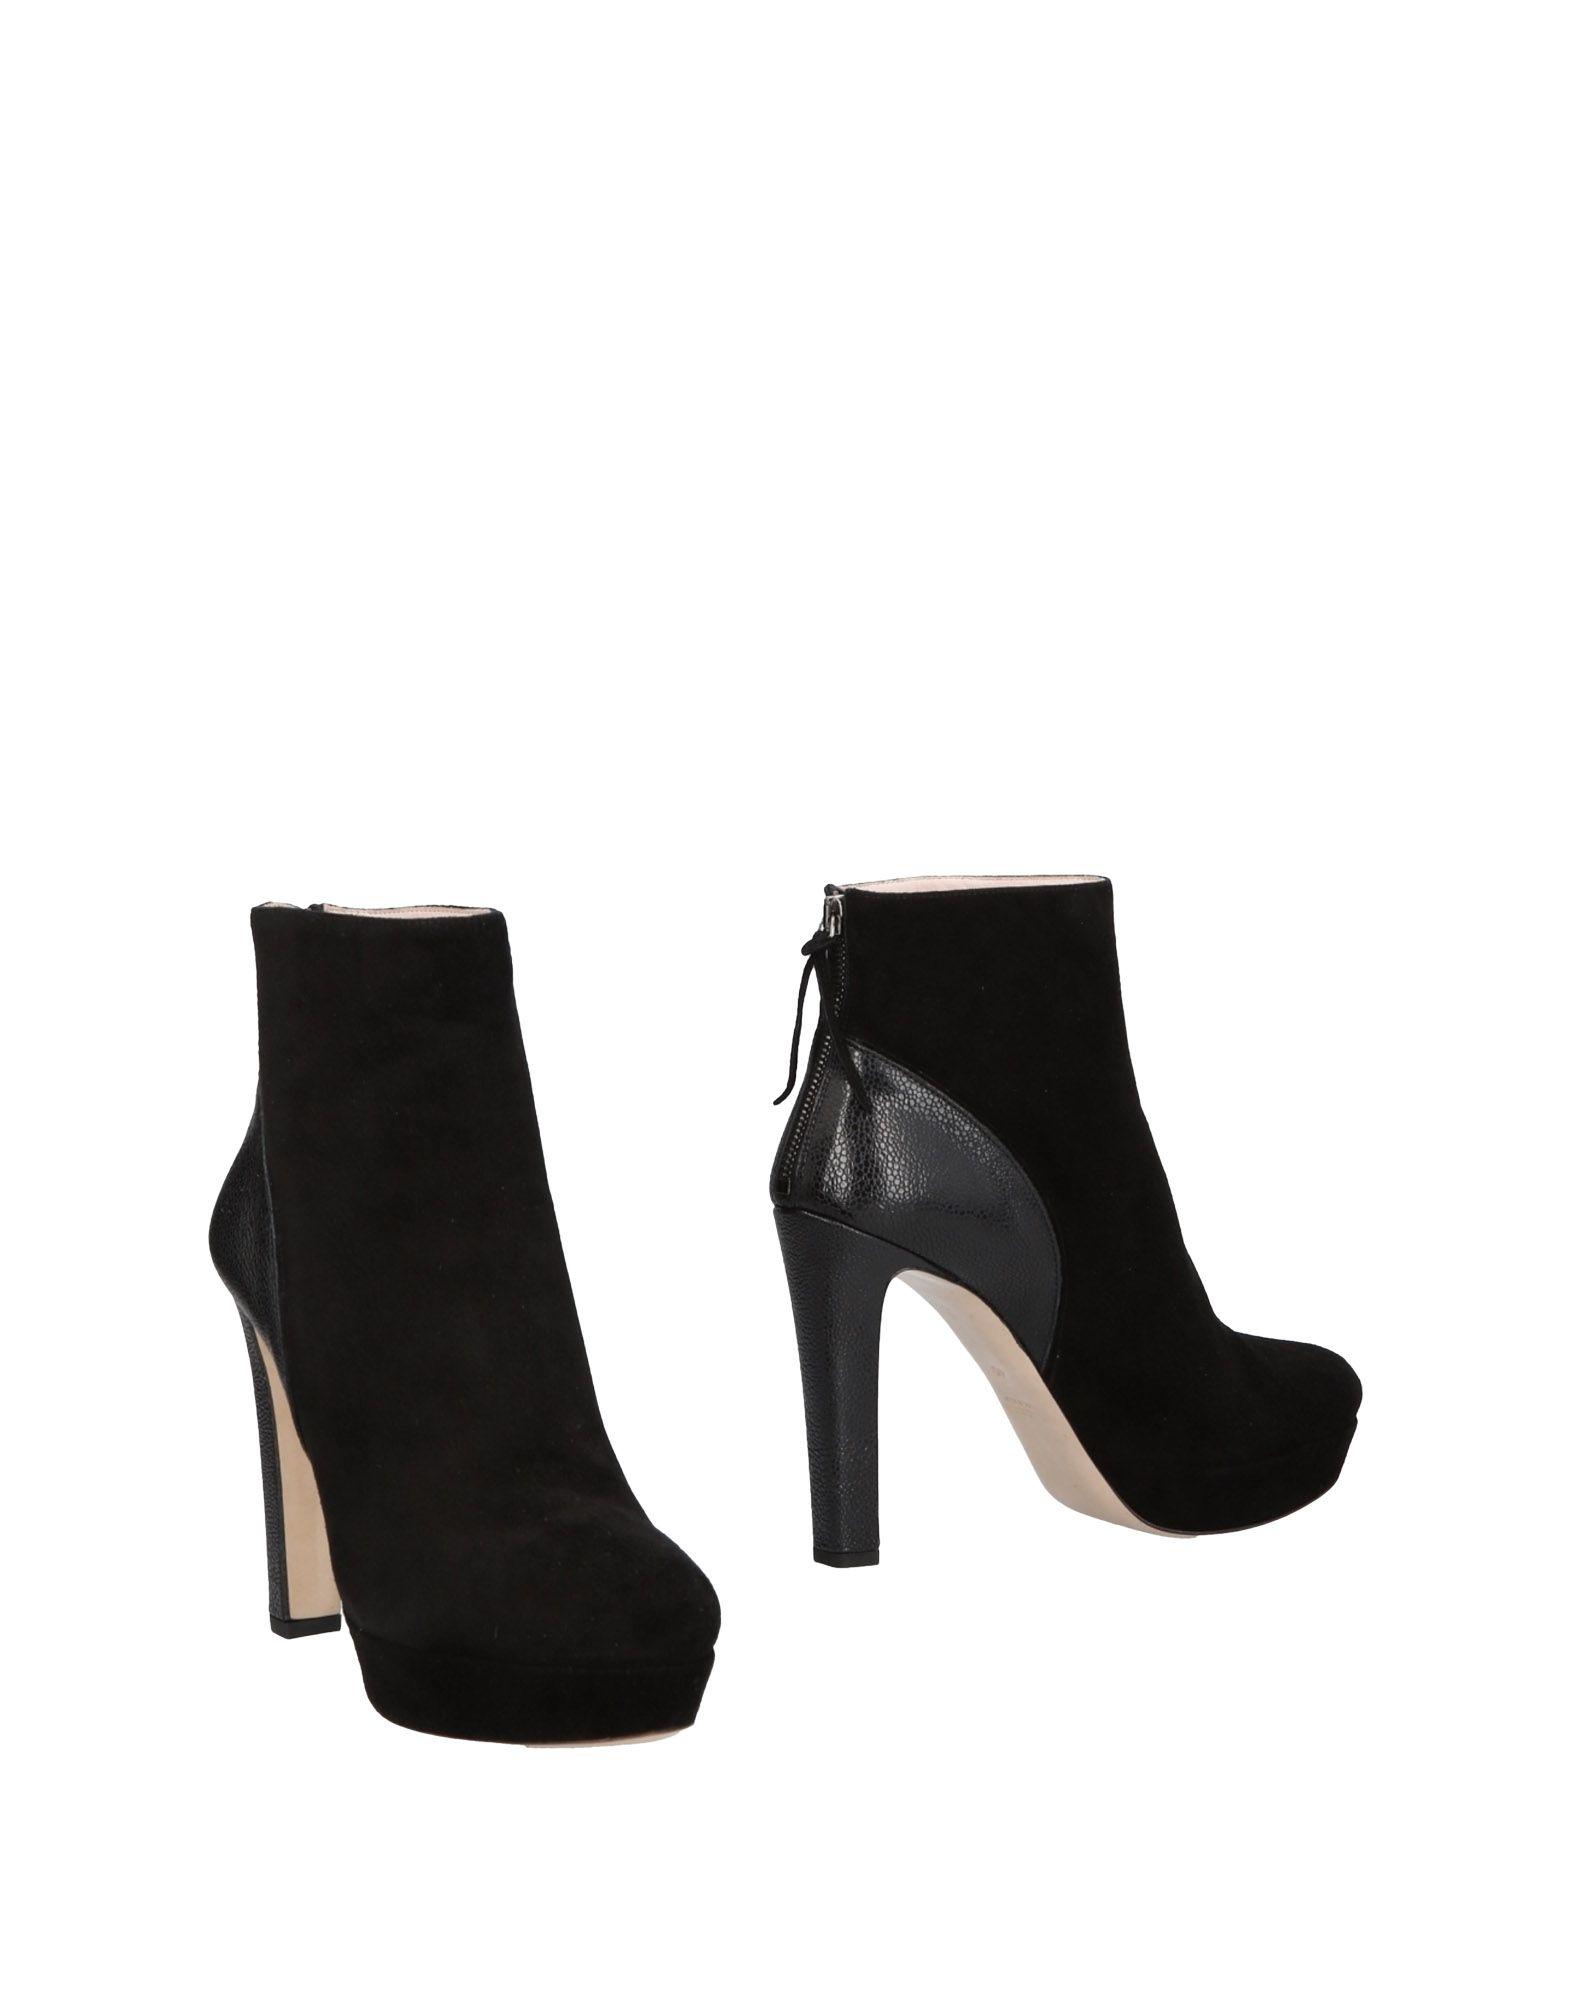 Miu Miu Stiefelette Damen  11471947KIGünstige gut aussehende Schuhe